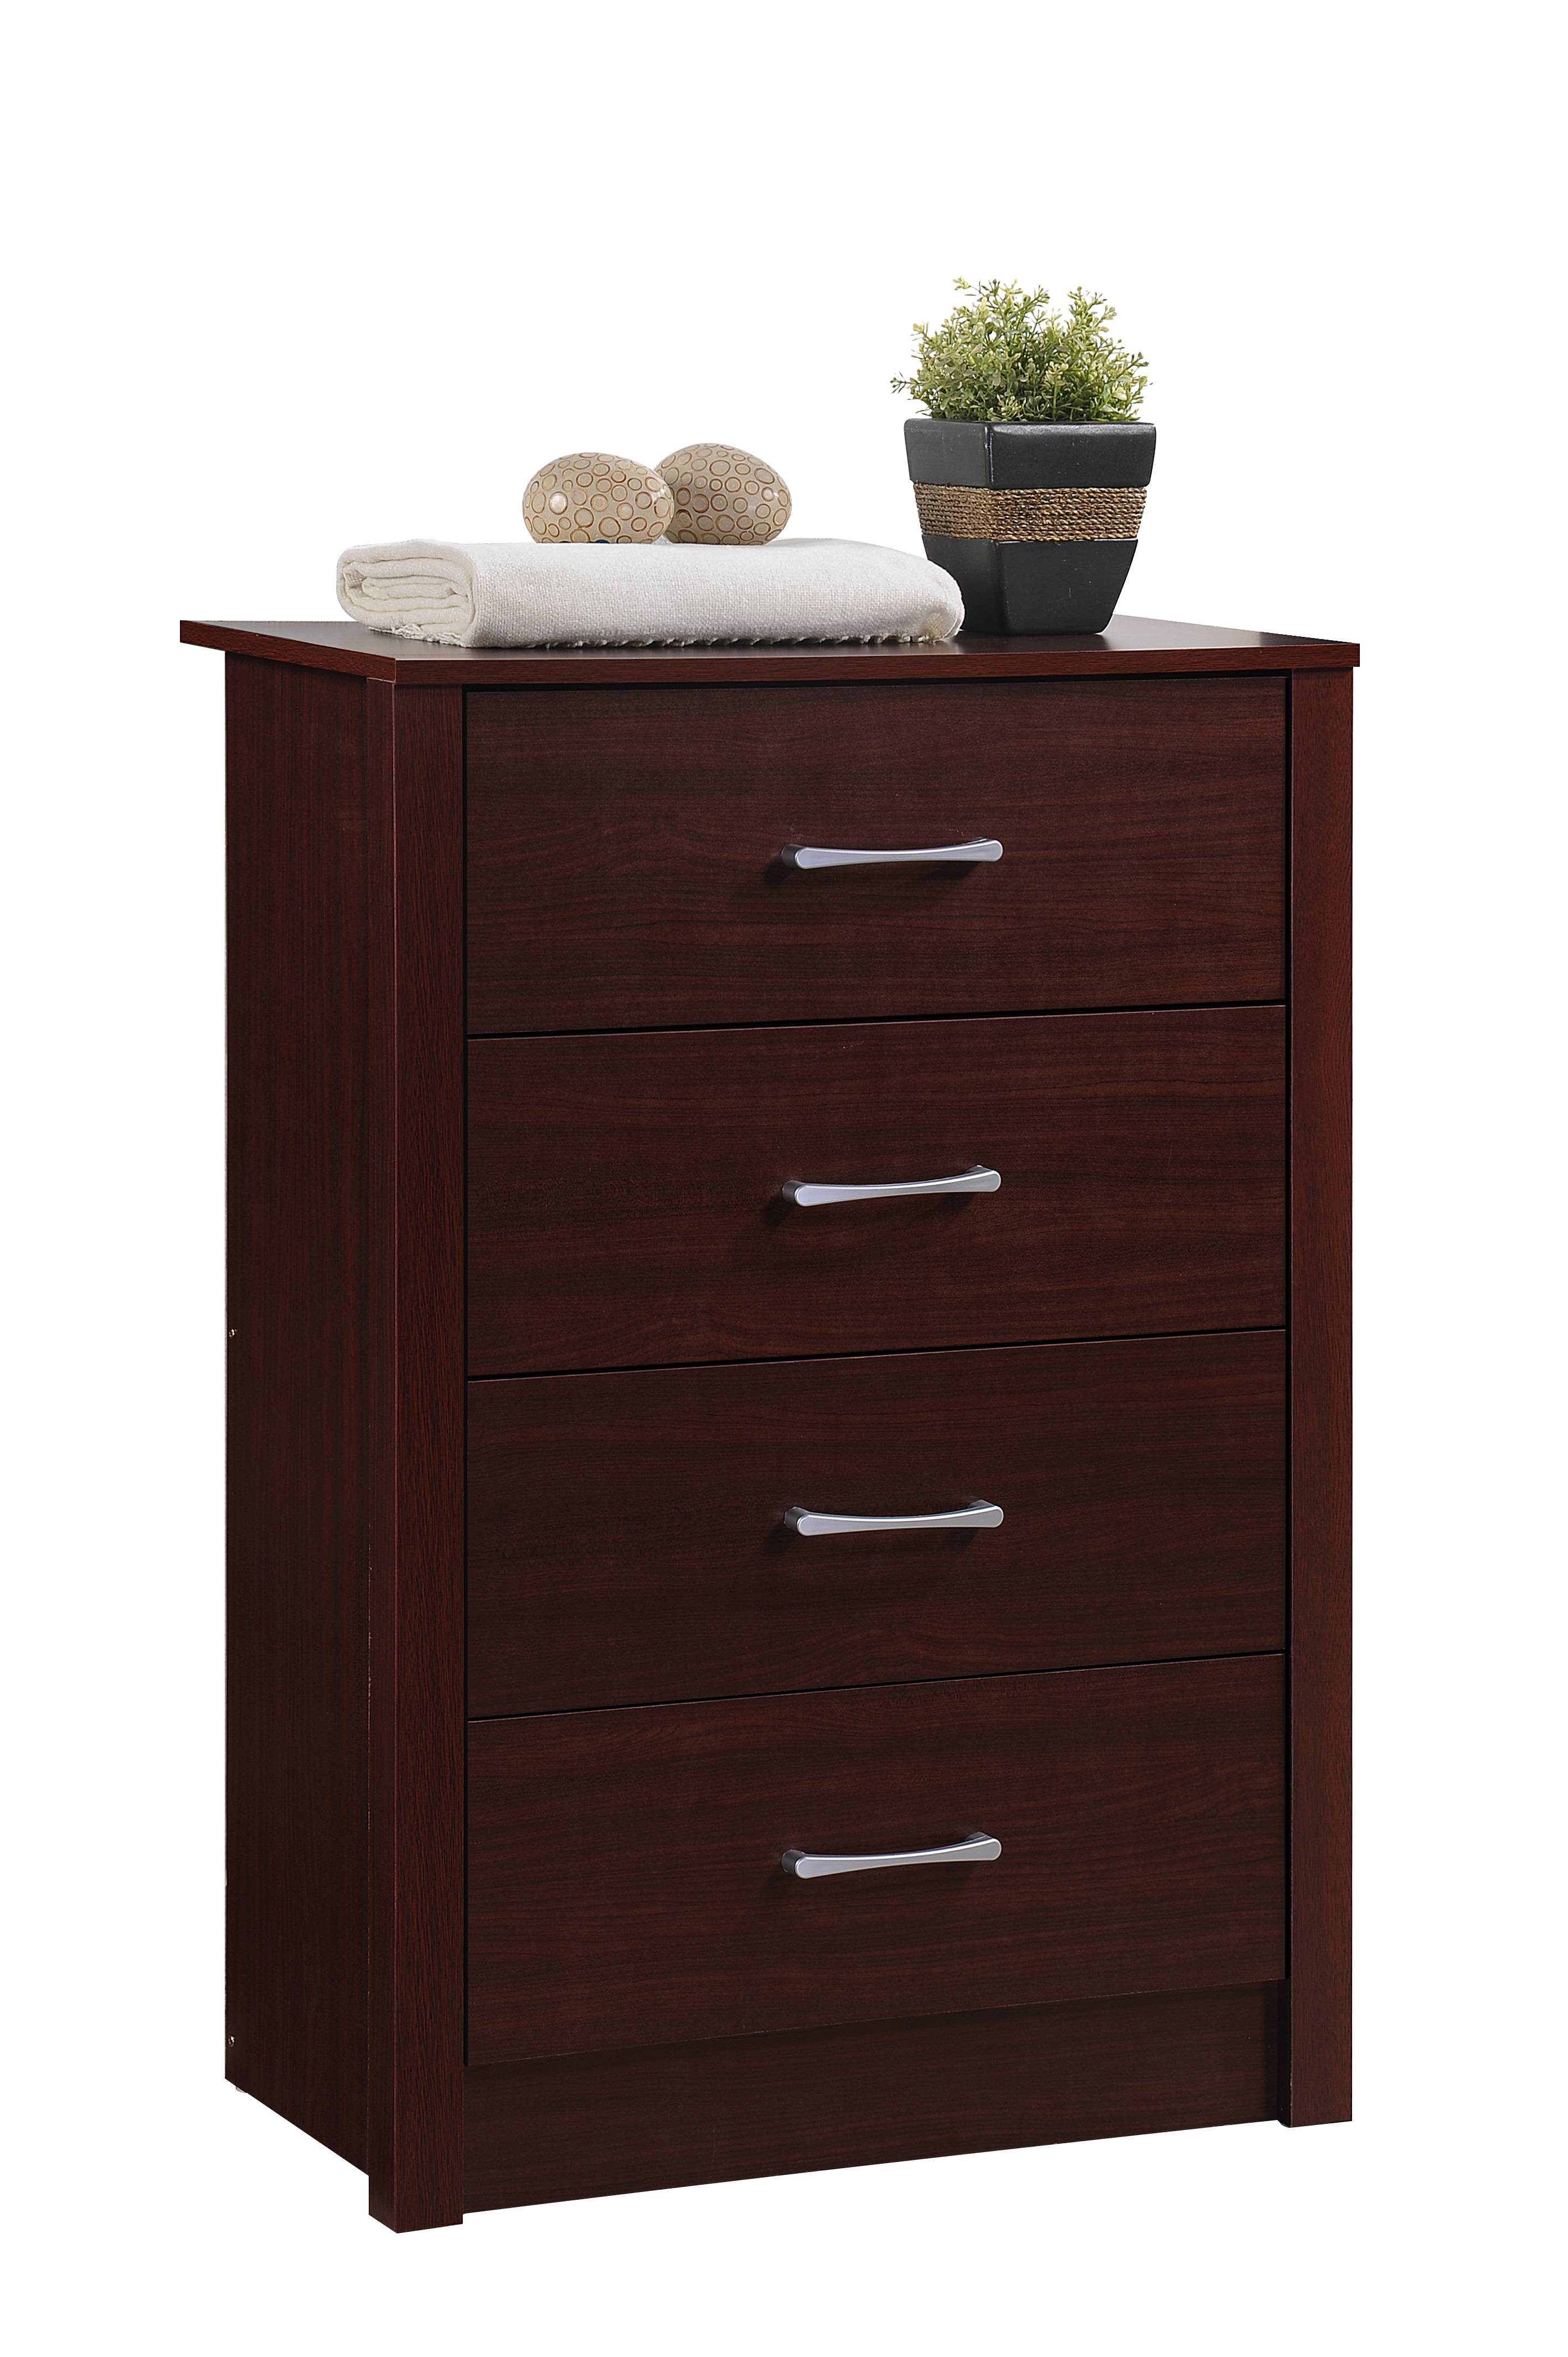 Mahogany Bedroom Dresser 4 Four Drawer